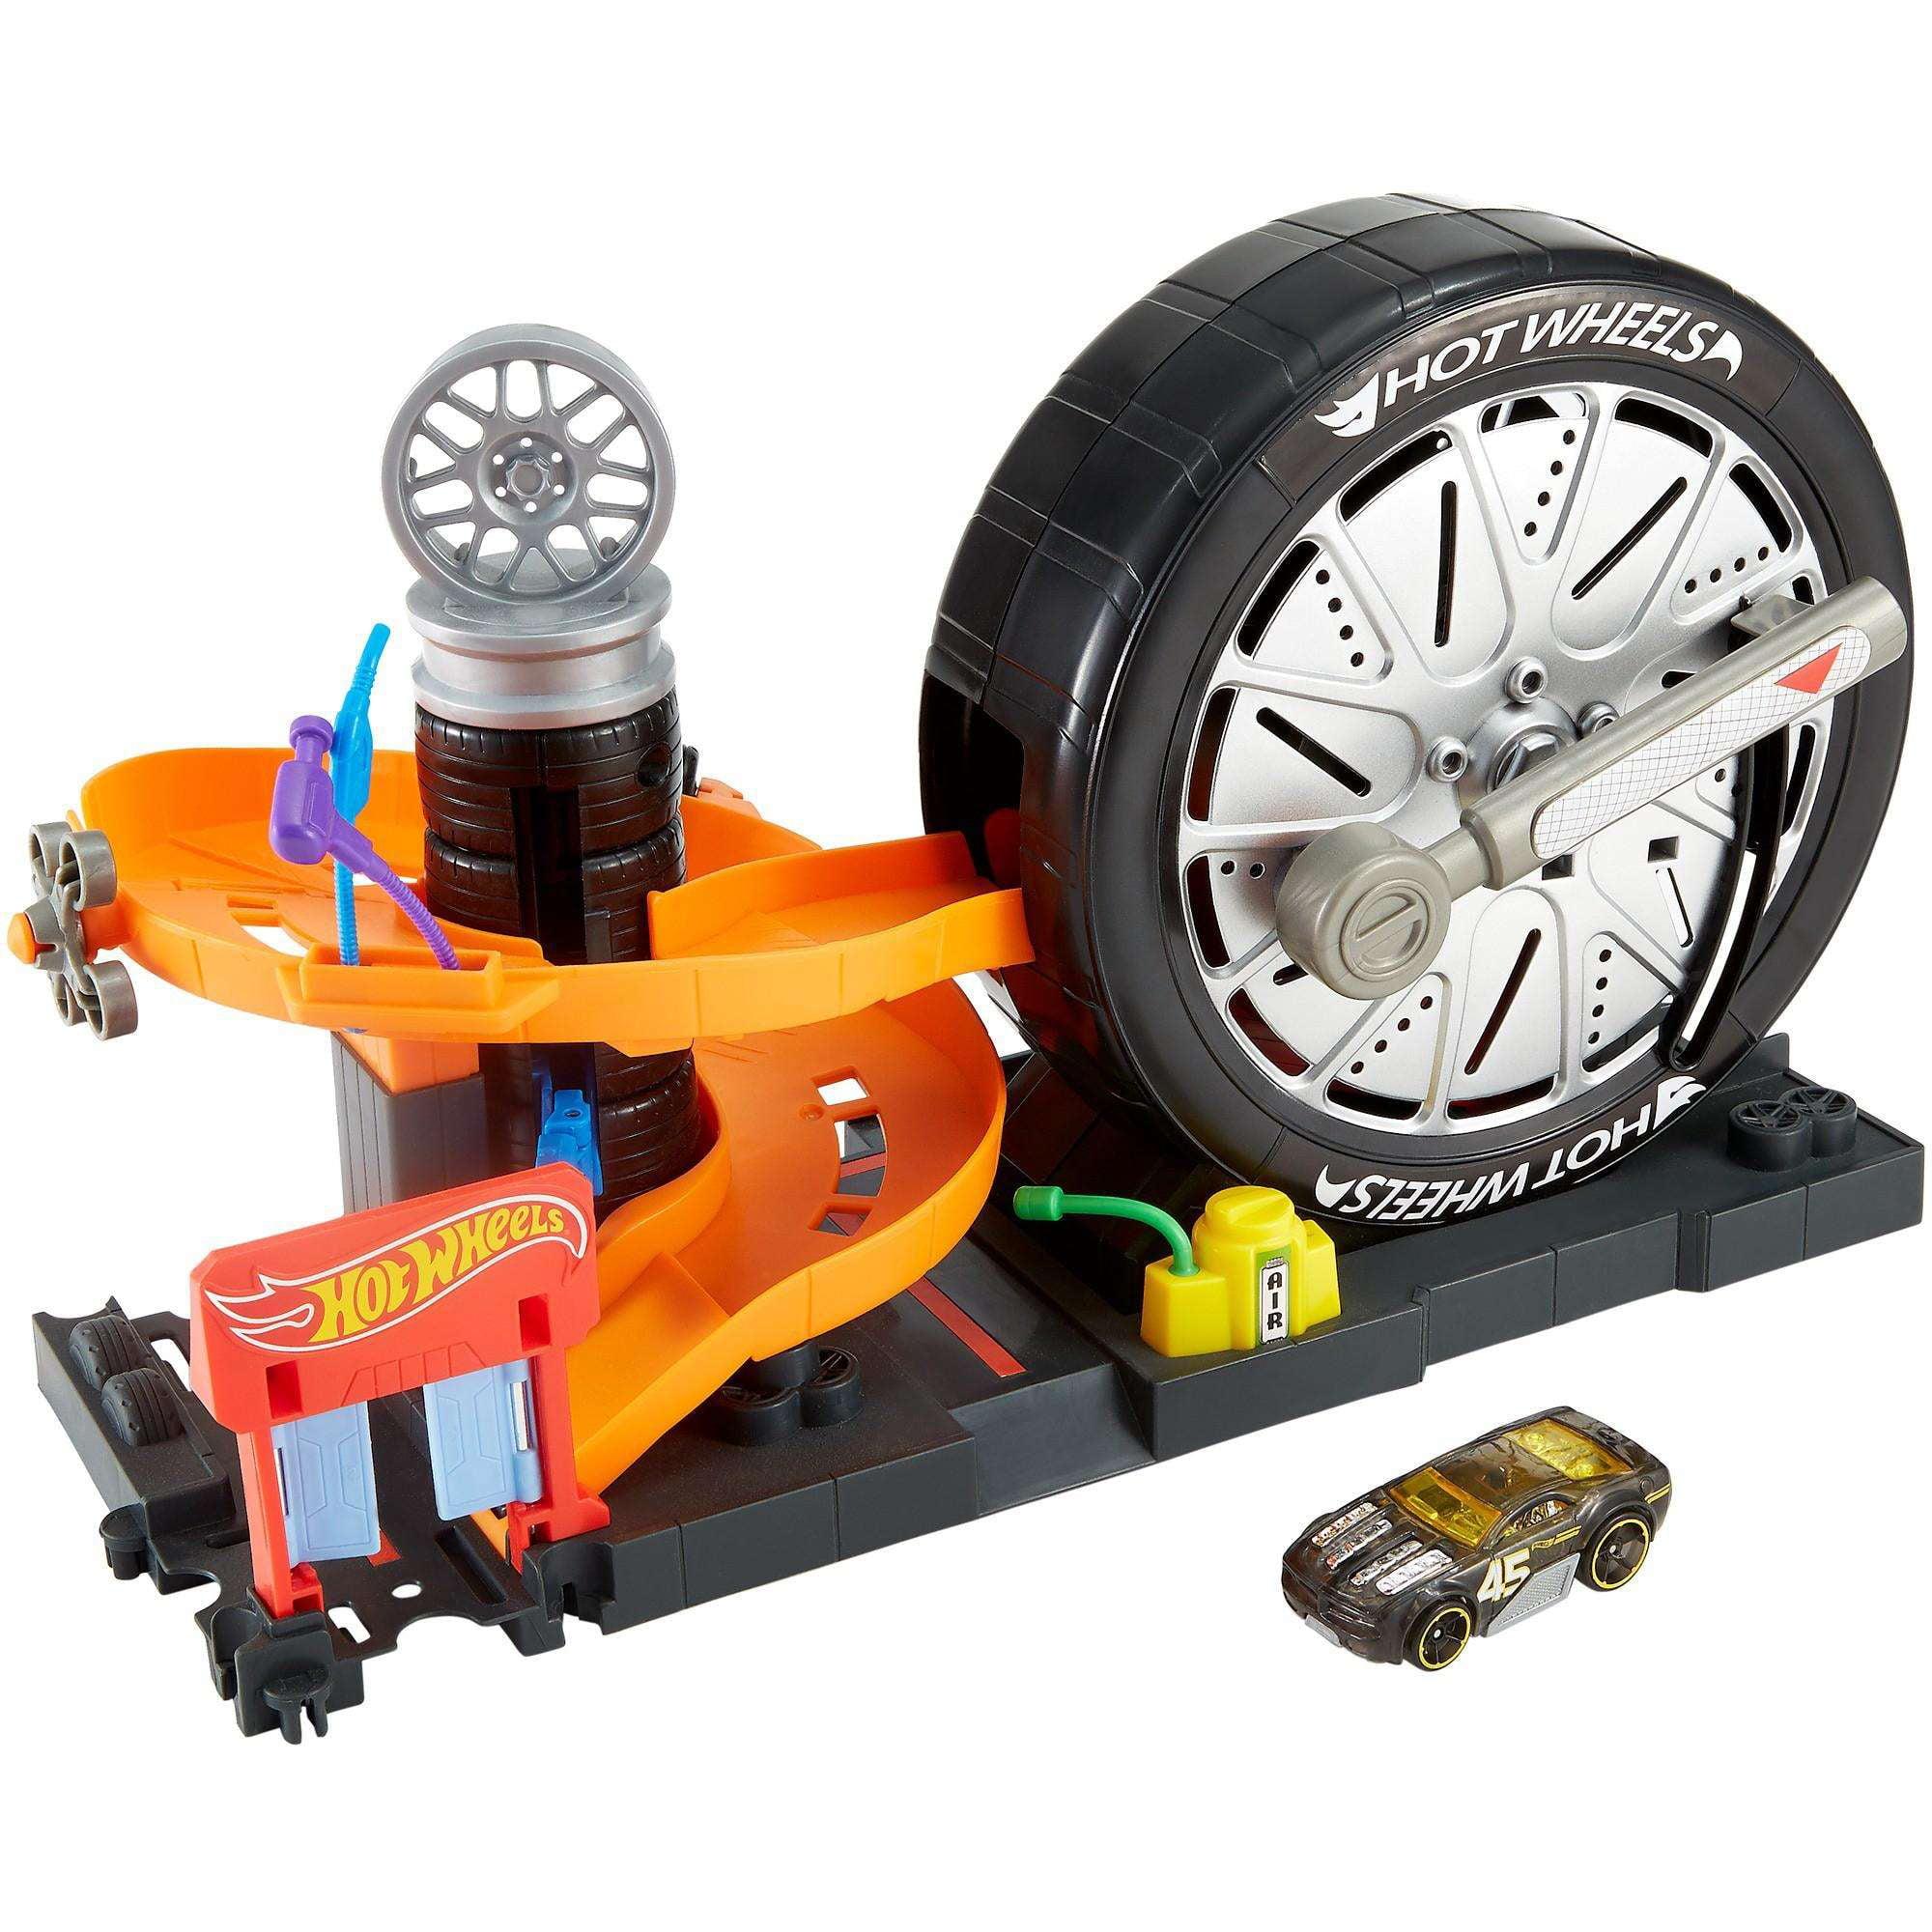 Hot Wheels City Super Spin Tire Shop Play Set by MATTEL INC.